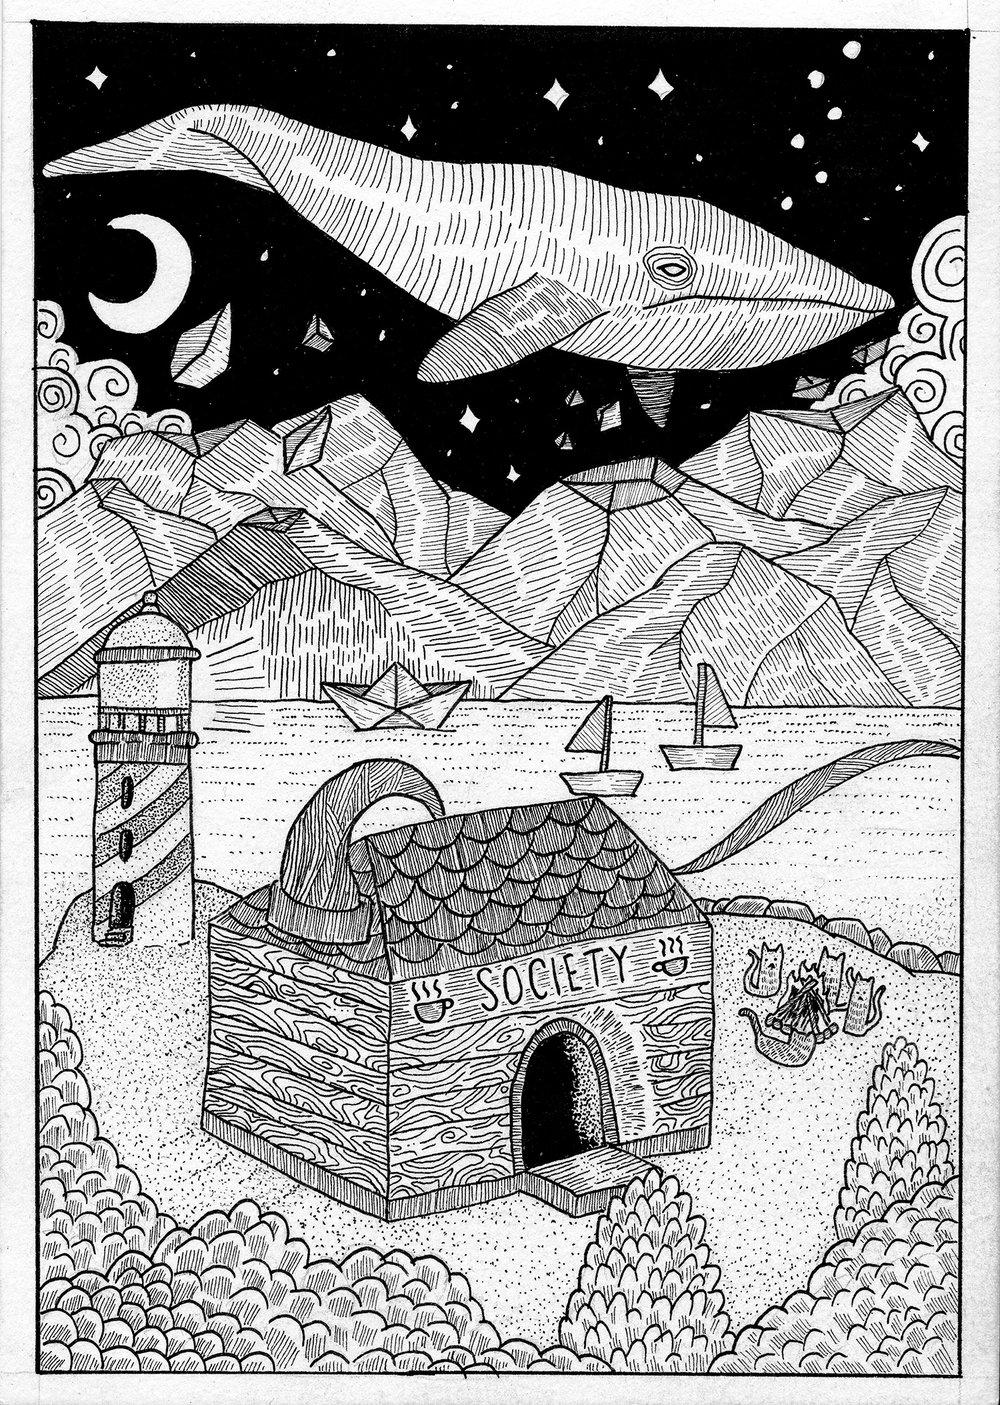 society-mural-idea.jpg